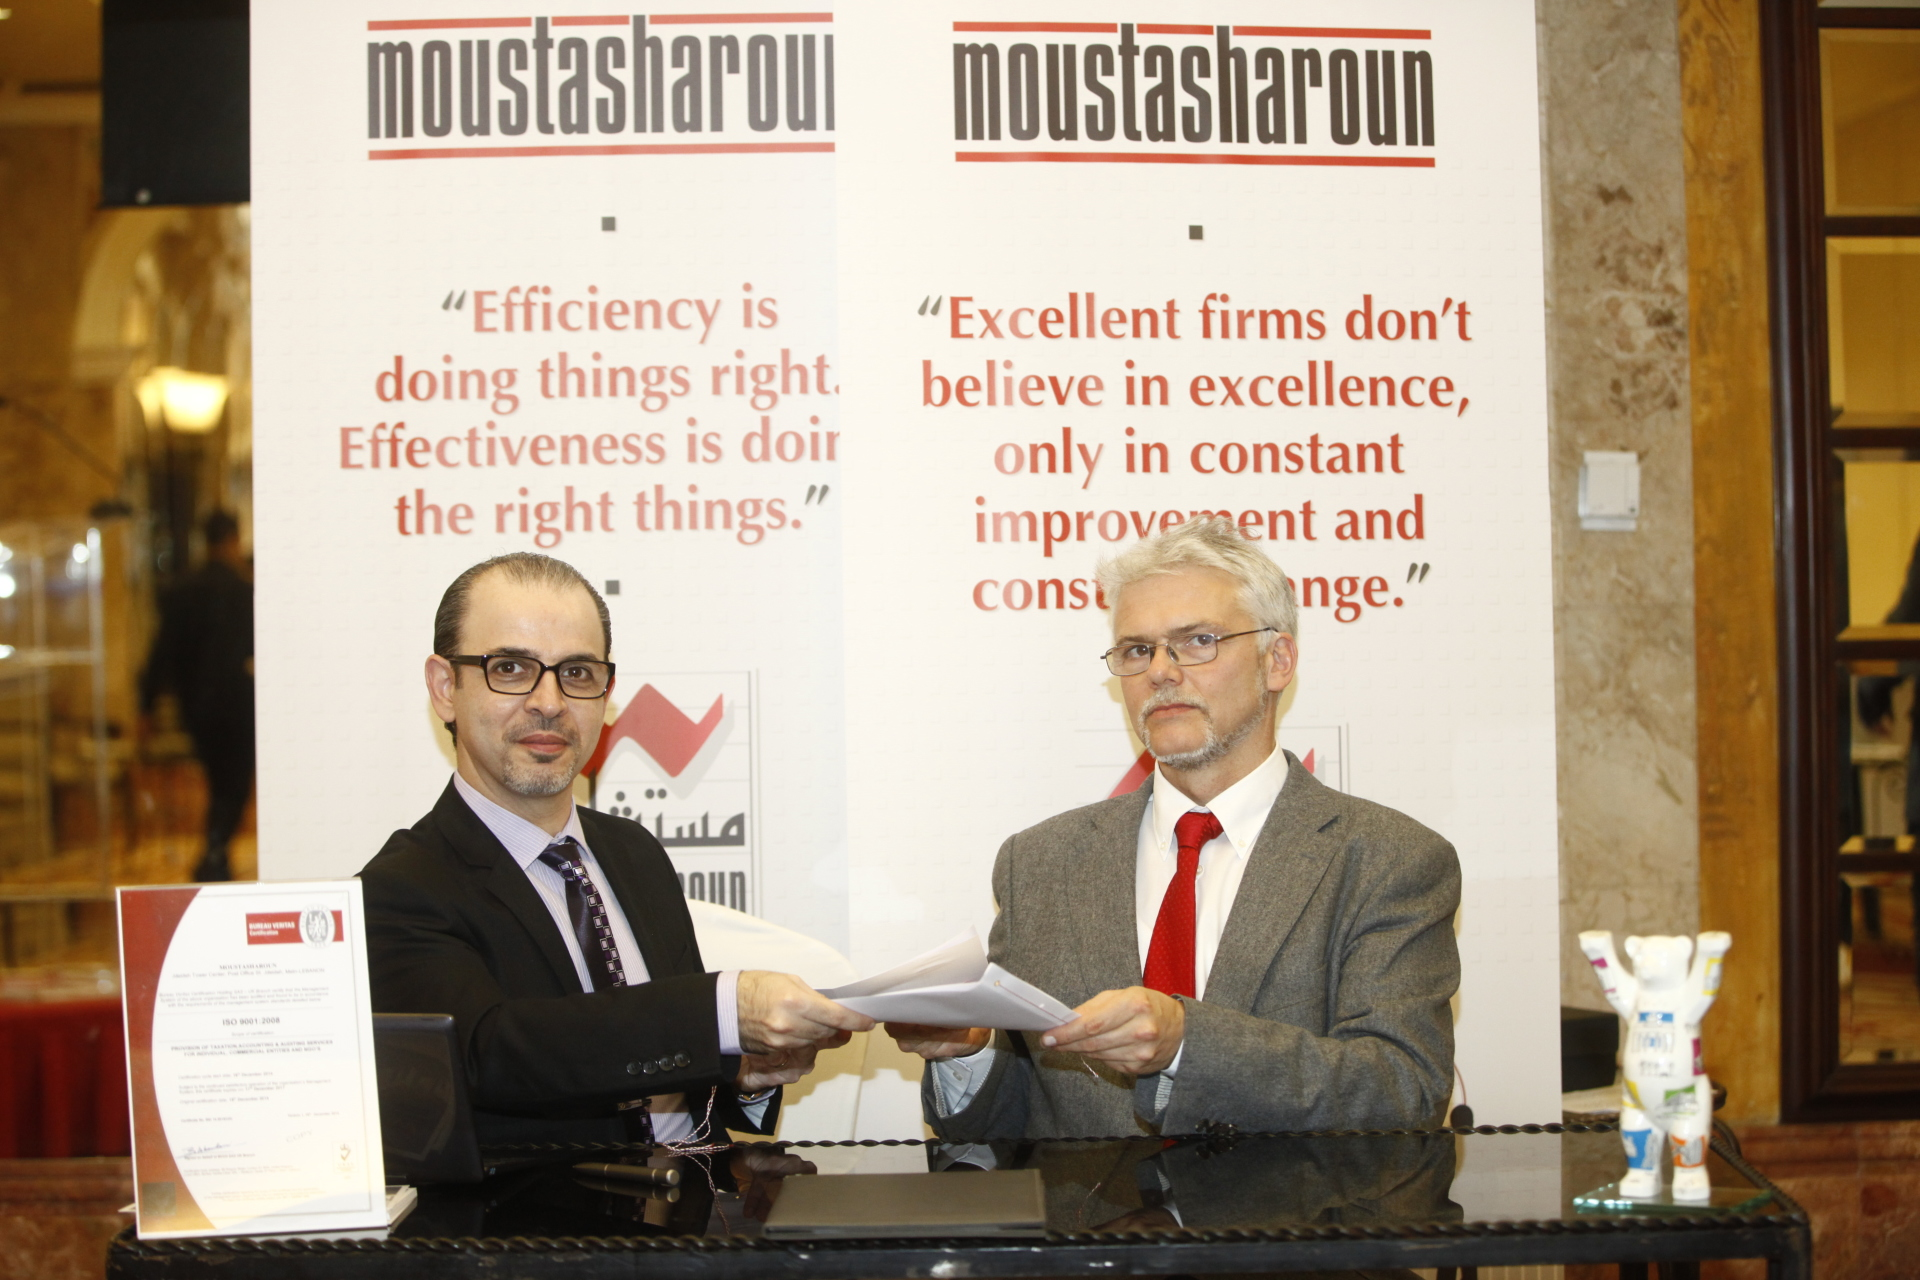 Moustasharoun Bureau signing the partnership  with Empacta